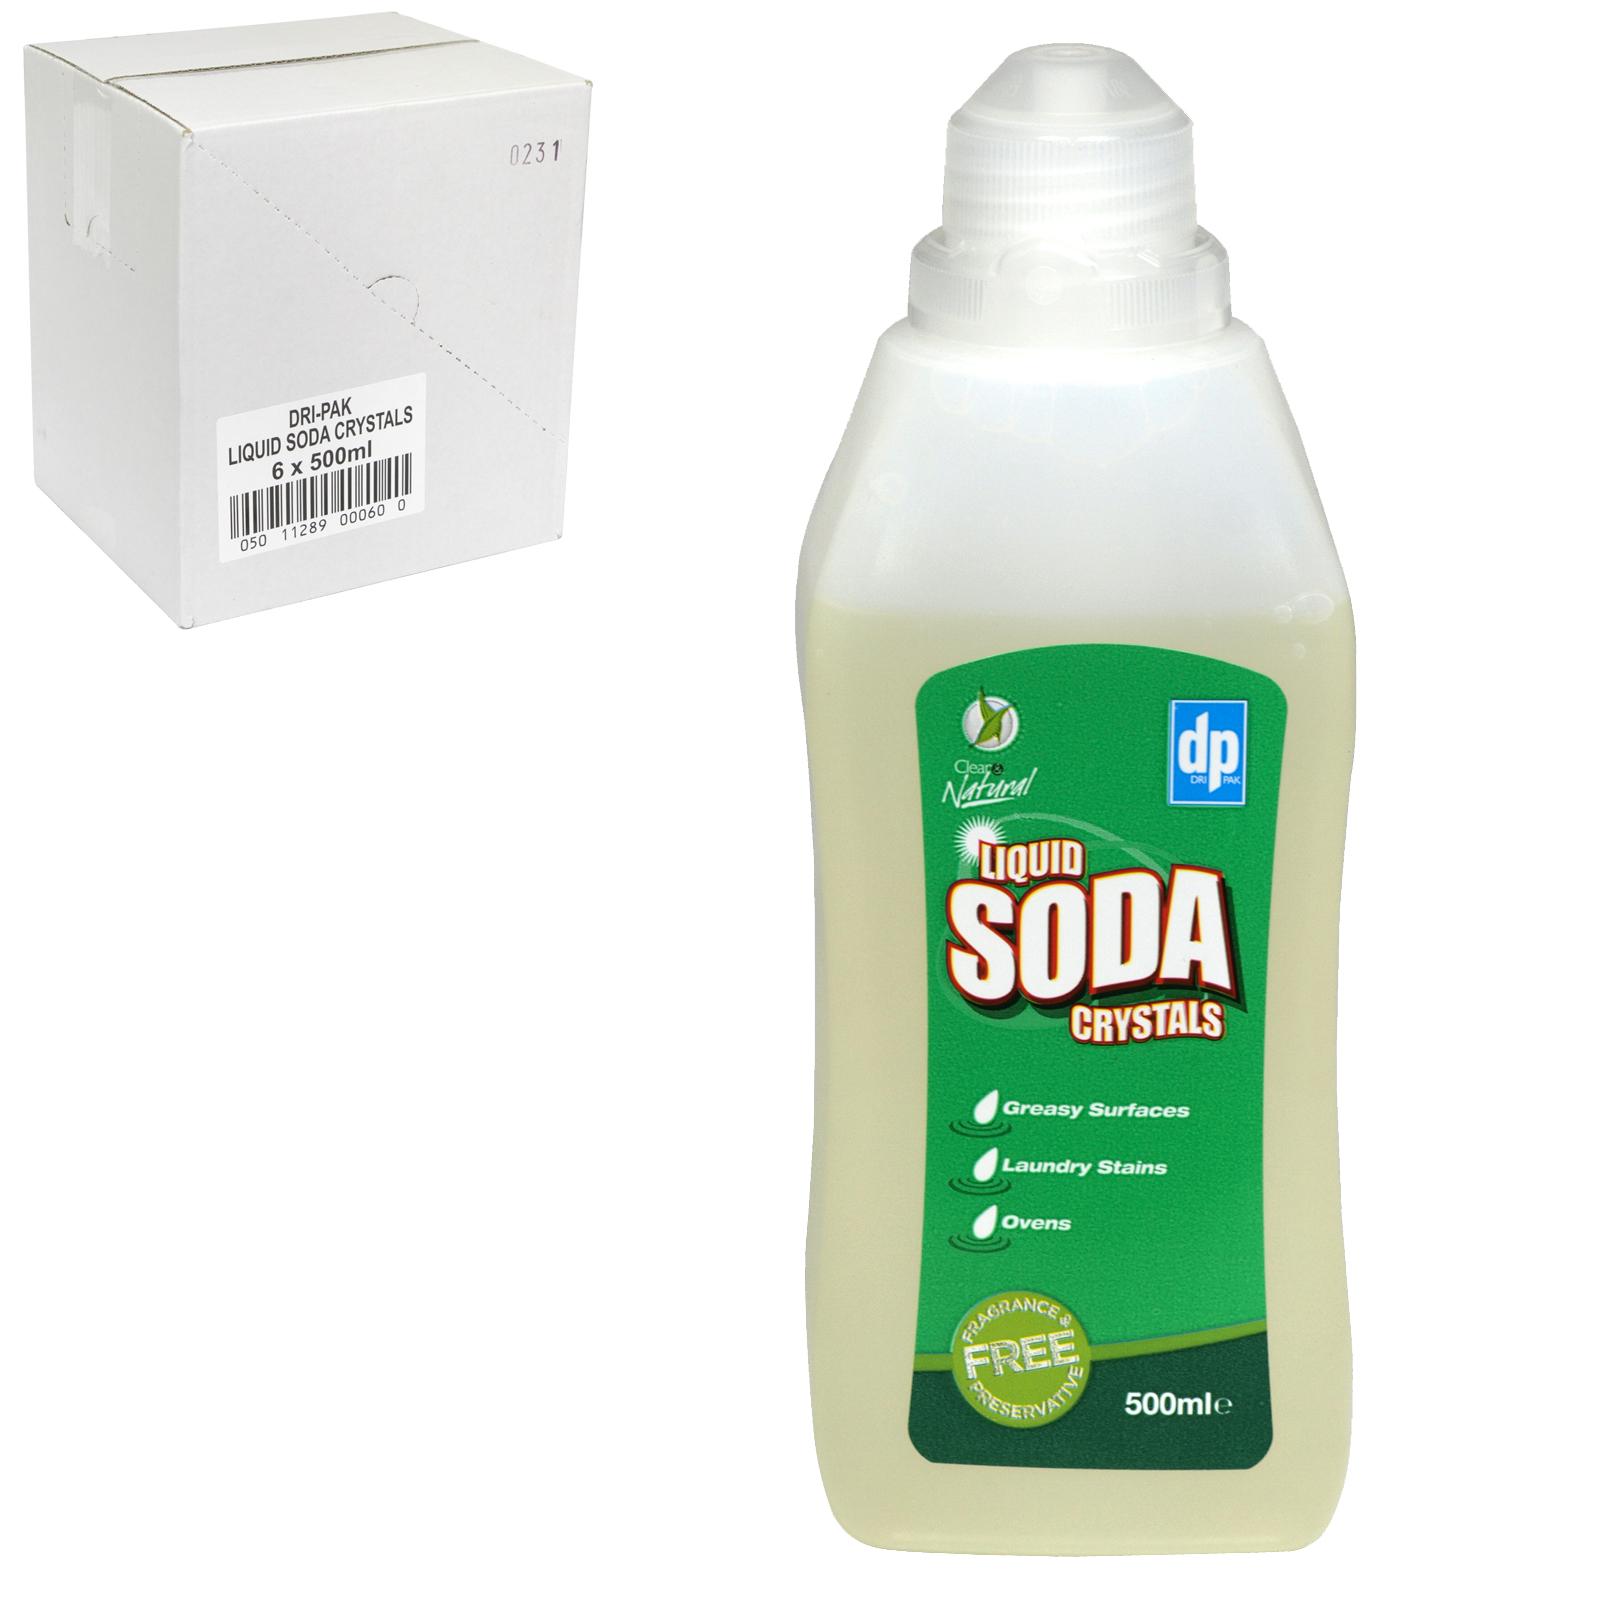 DRI-PAK LIQUID SODA CRYSTALS 500ML X6